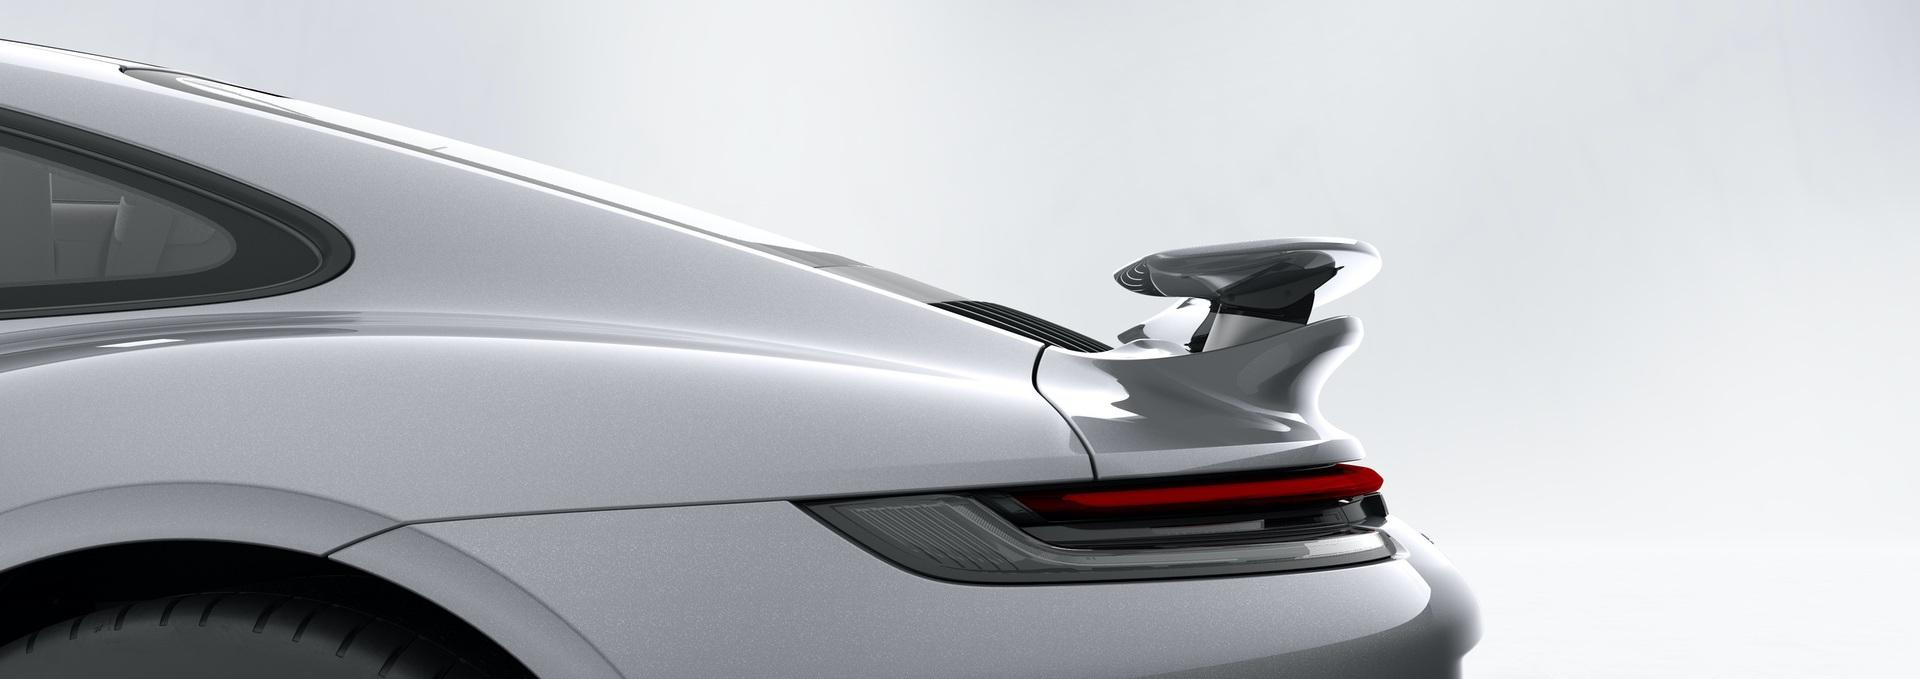 2020_Porsche_911-Turbo_S-aerodynamics_0007